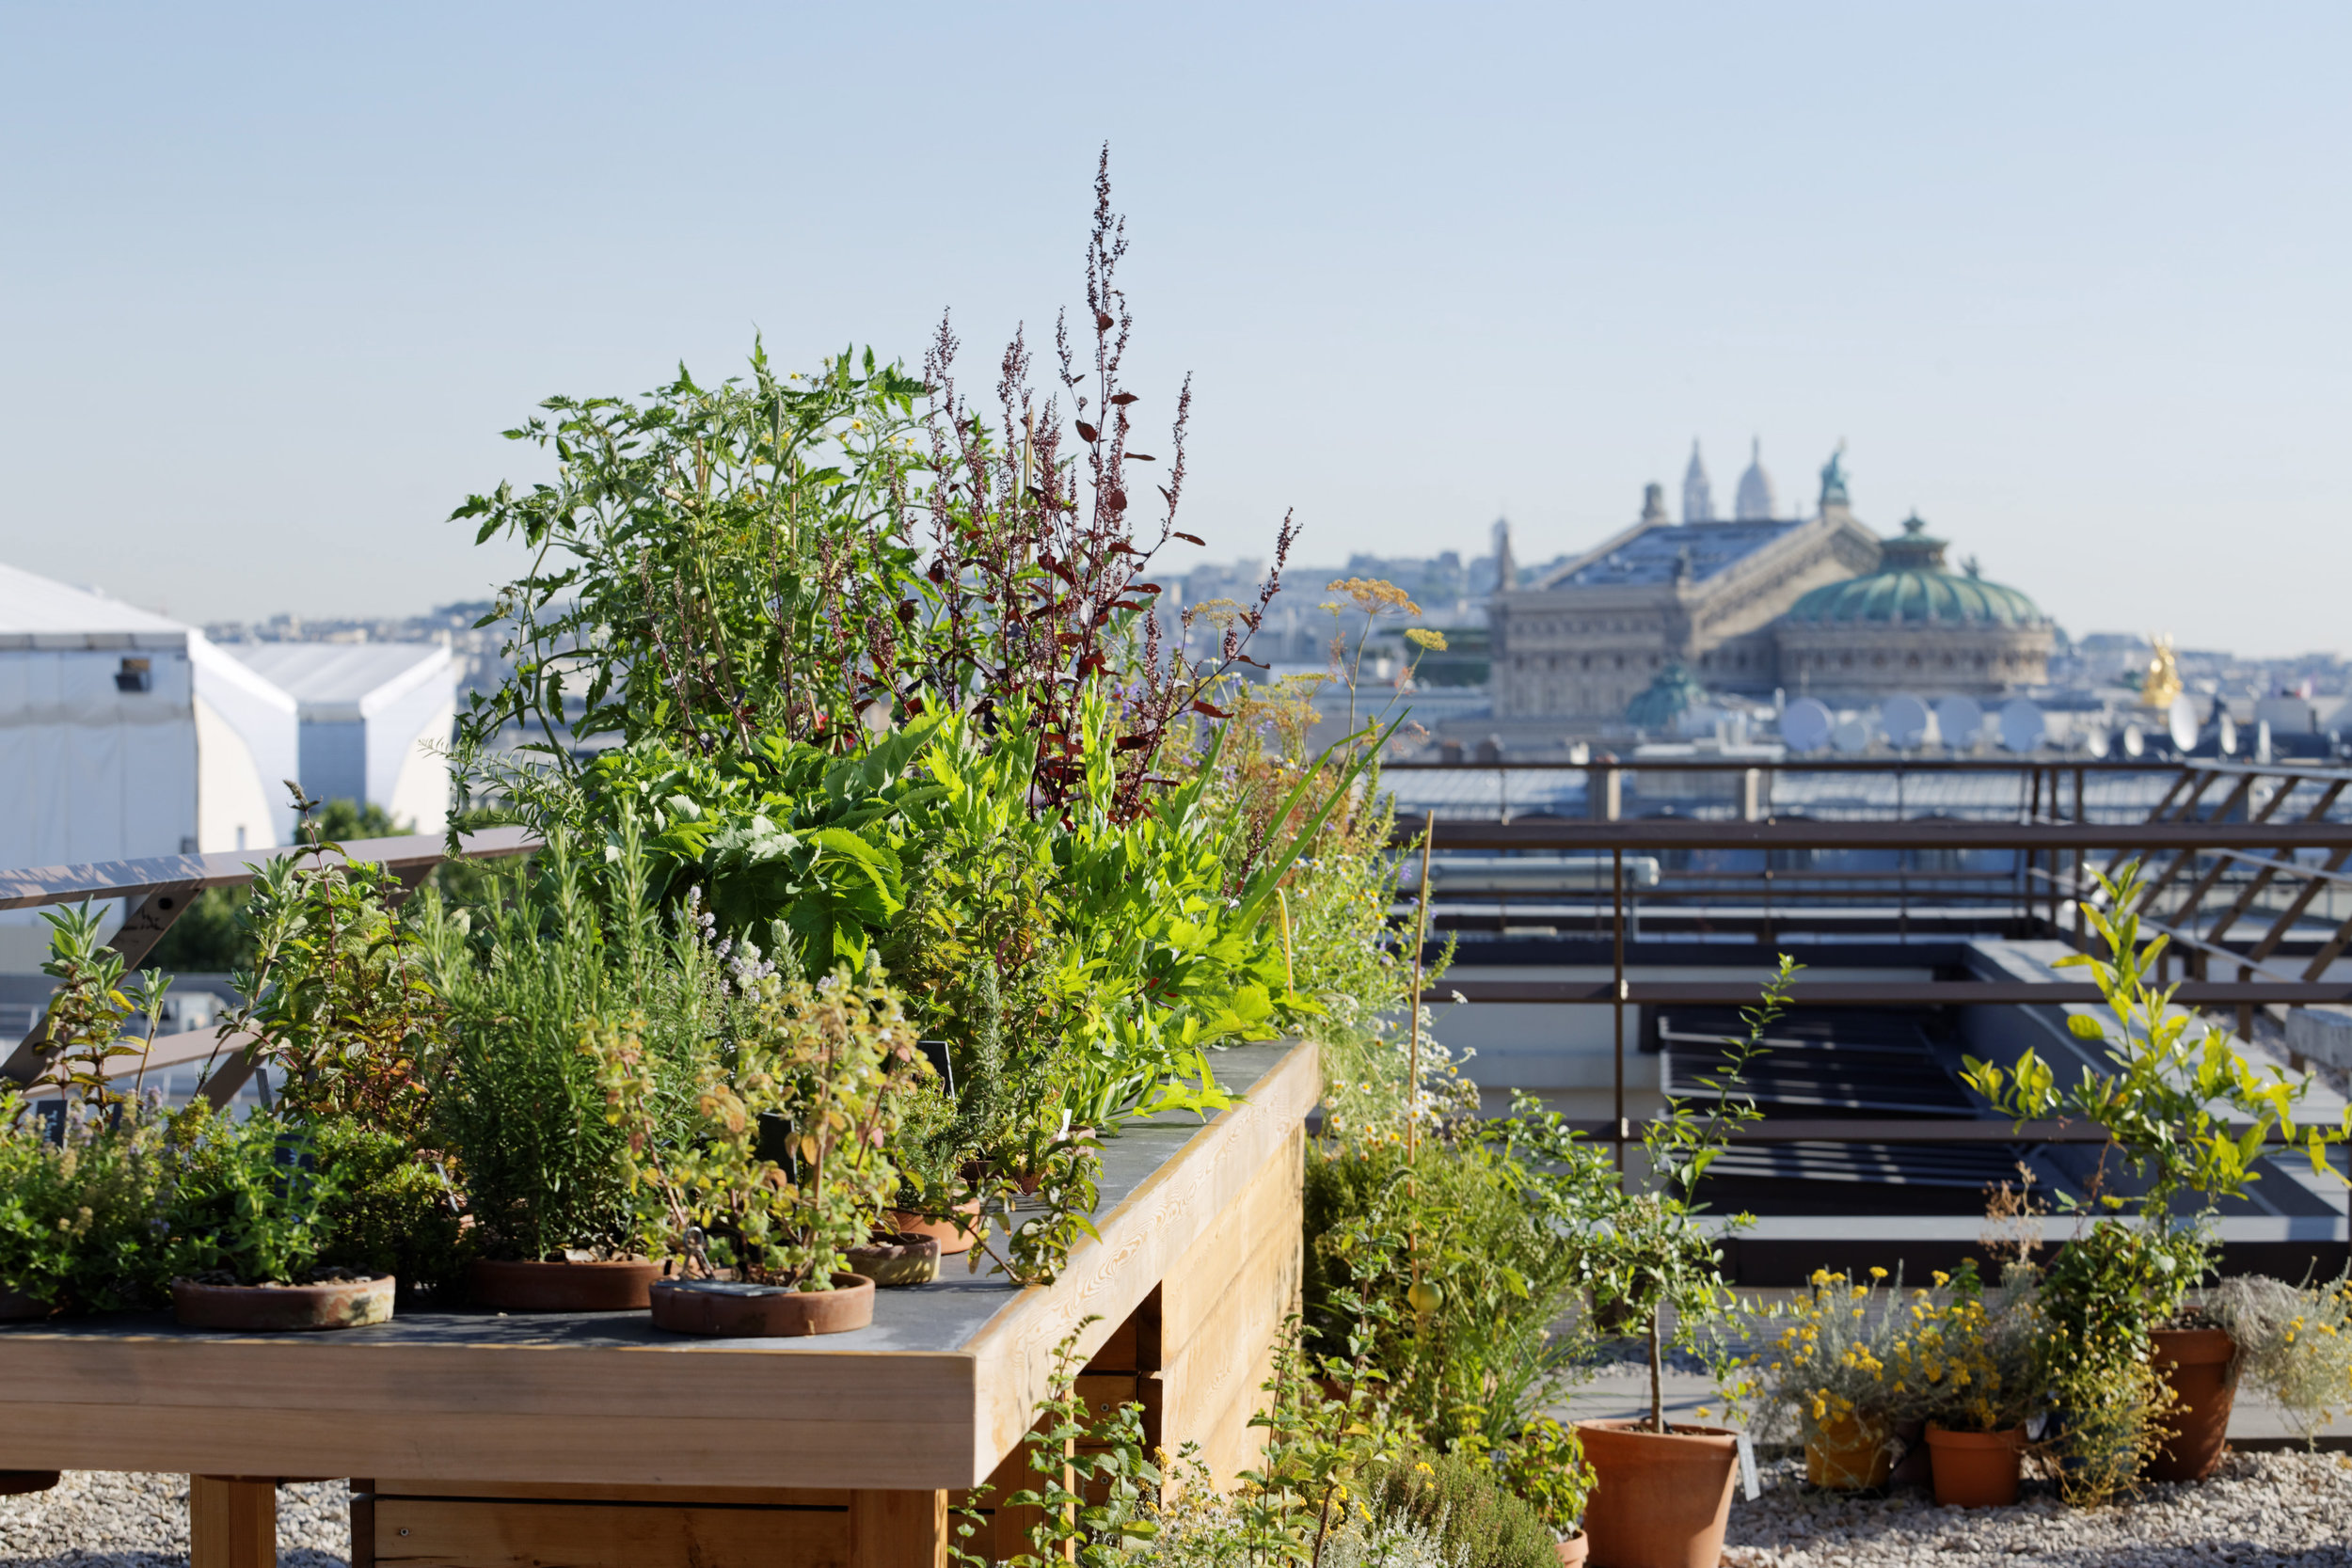 hôtel_mandarin_oriental_paris_terrasses_jardins_potager_thierry_marx_christophe_gautrand_paysagiste_8.jpg